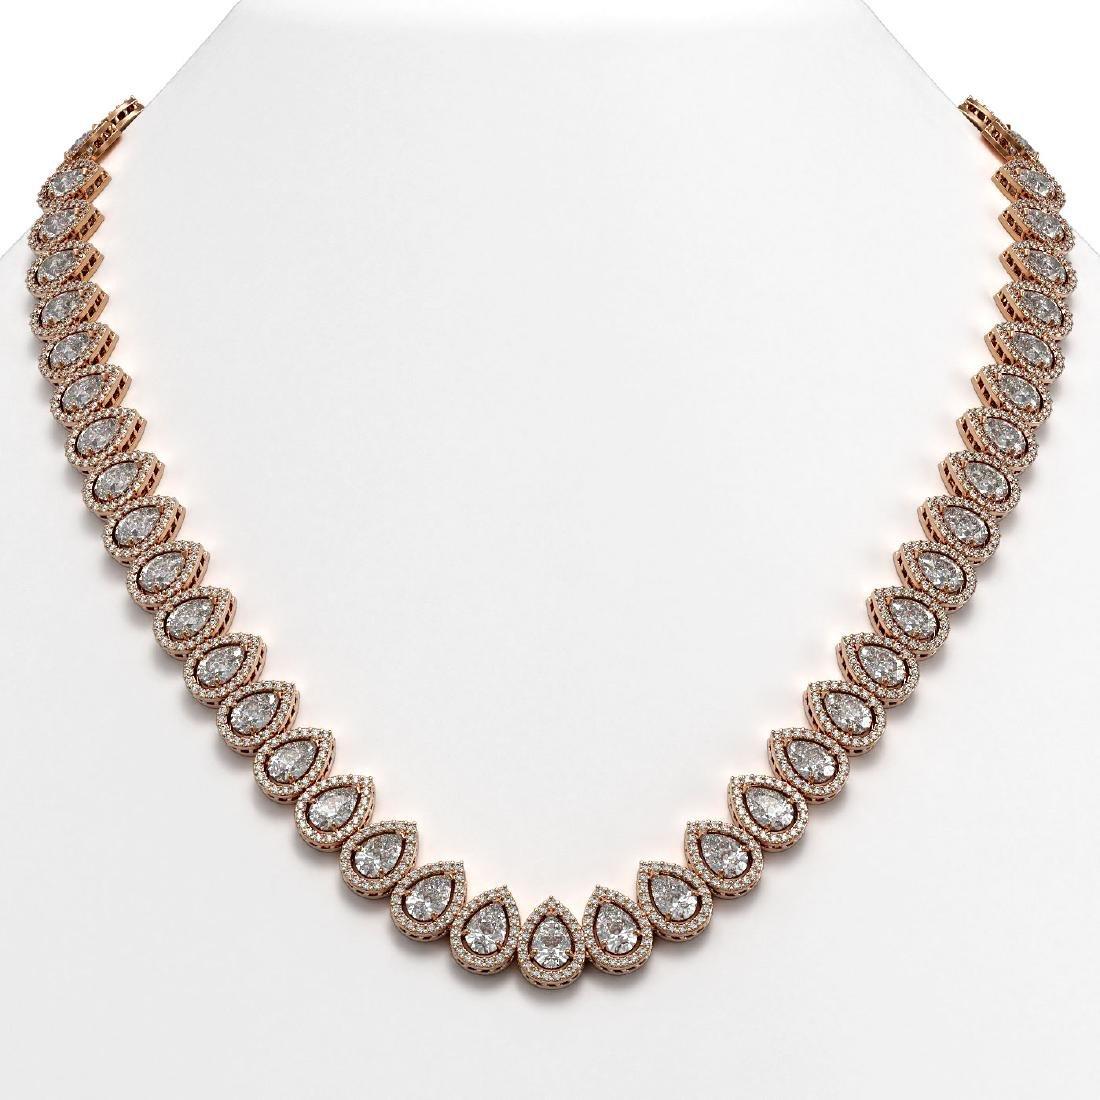 34.83 CTW Pear Diamond Designer Necklace 18K Rose Gold